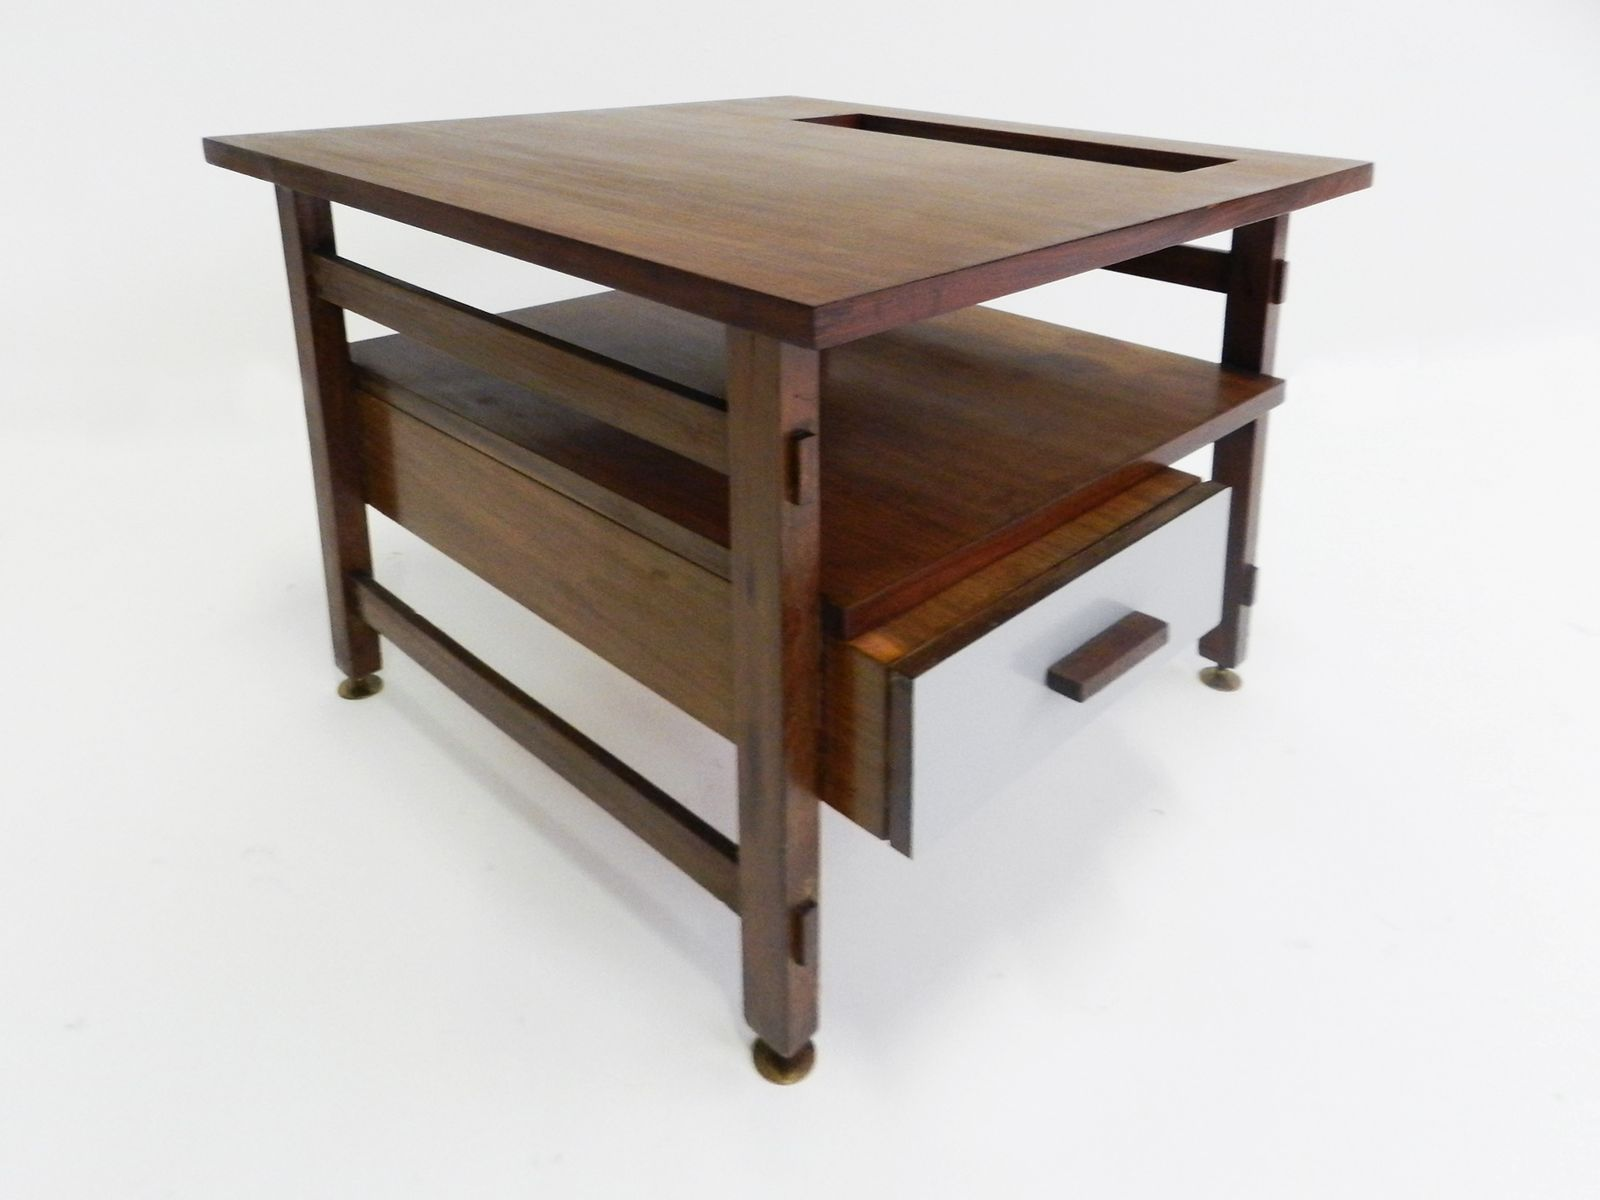 Teak Laminate Coffee Table For Sale At Pamono